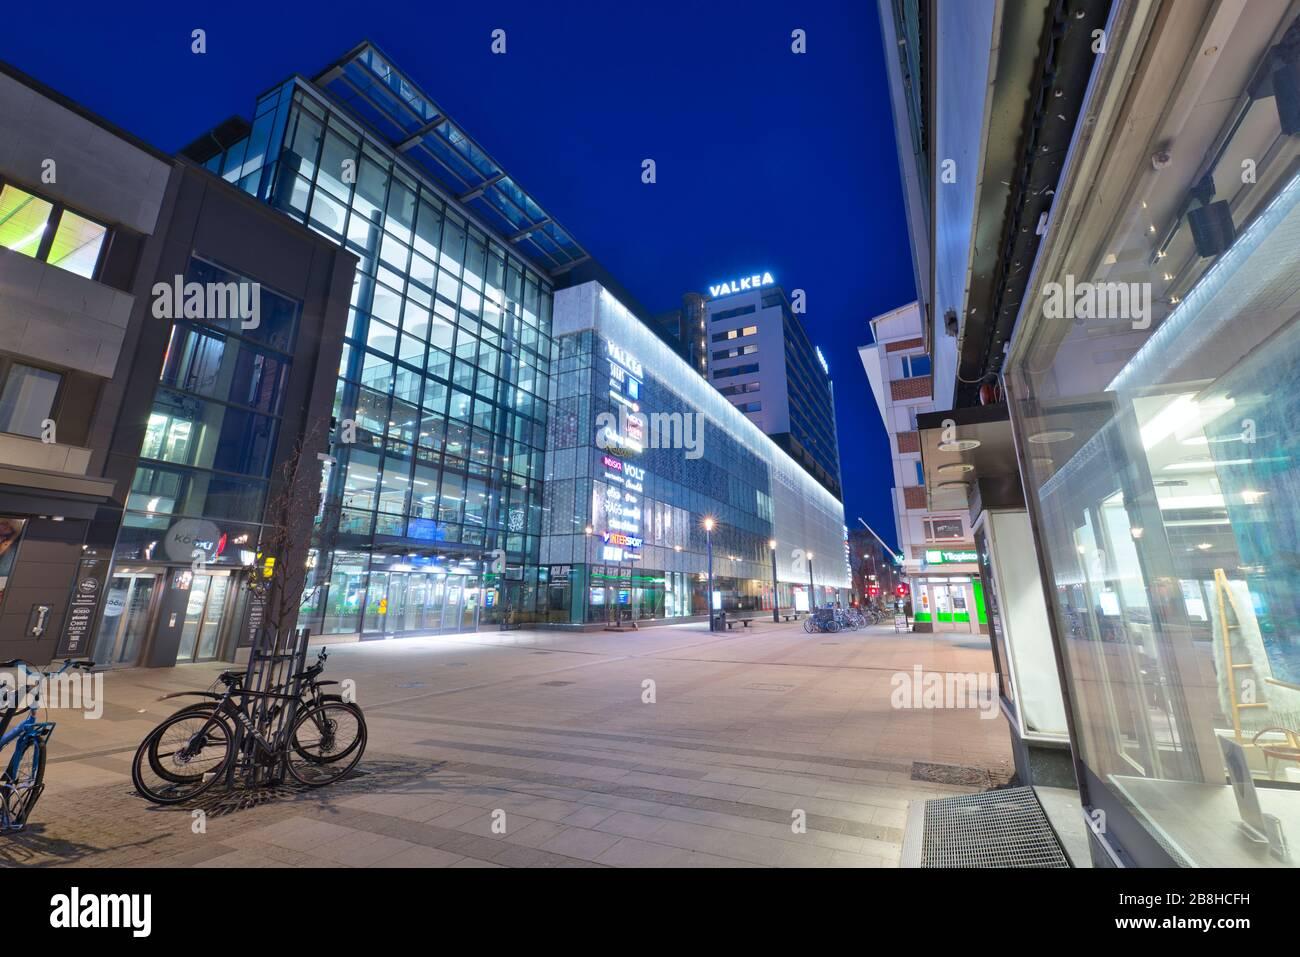 Valkea Shopping Center in Oulu, Finland Stock Photo